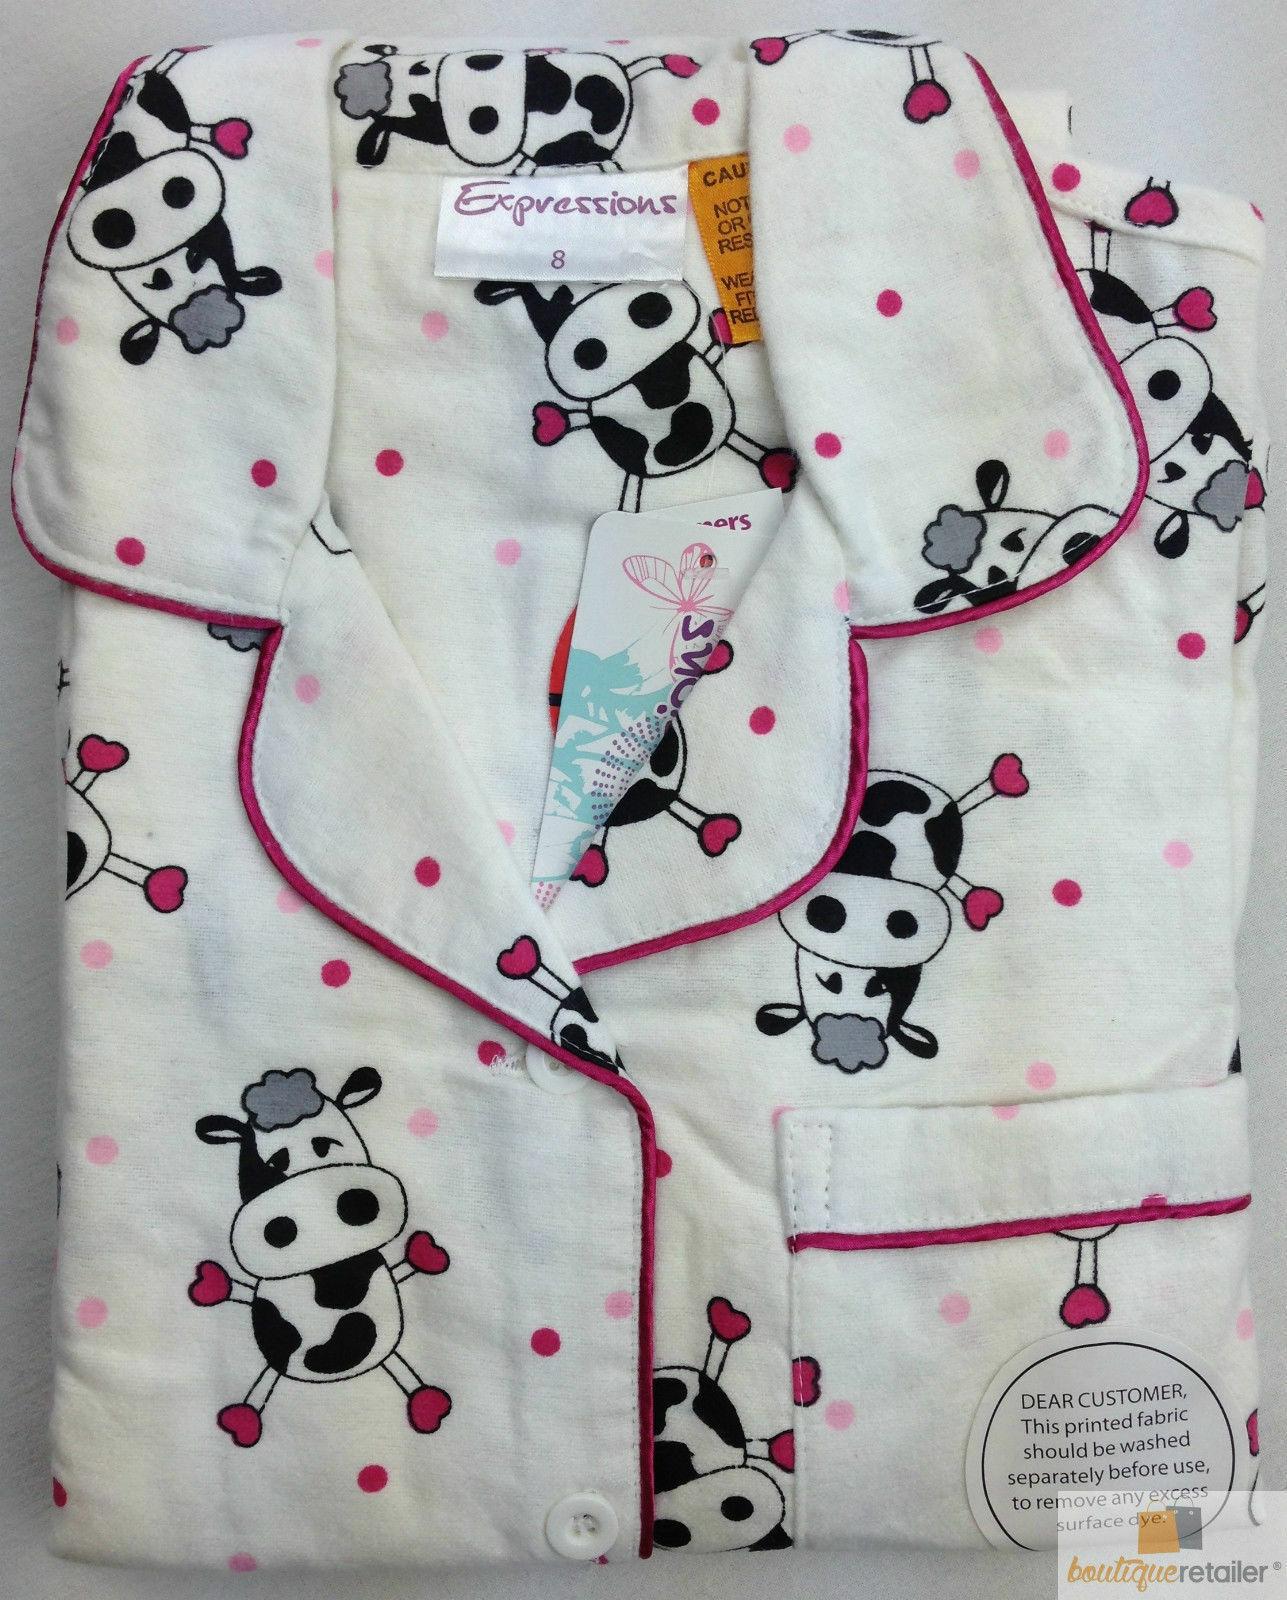 KIDS WINTER FLANNELETTE PYJAMAS PJs Boys Girls Flannel Pajamas Pyjama Set PJ